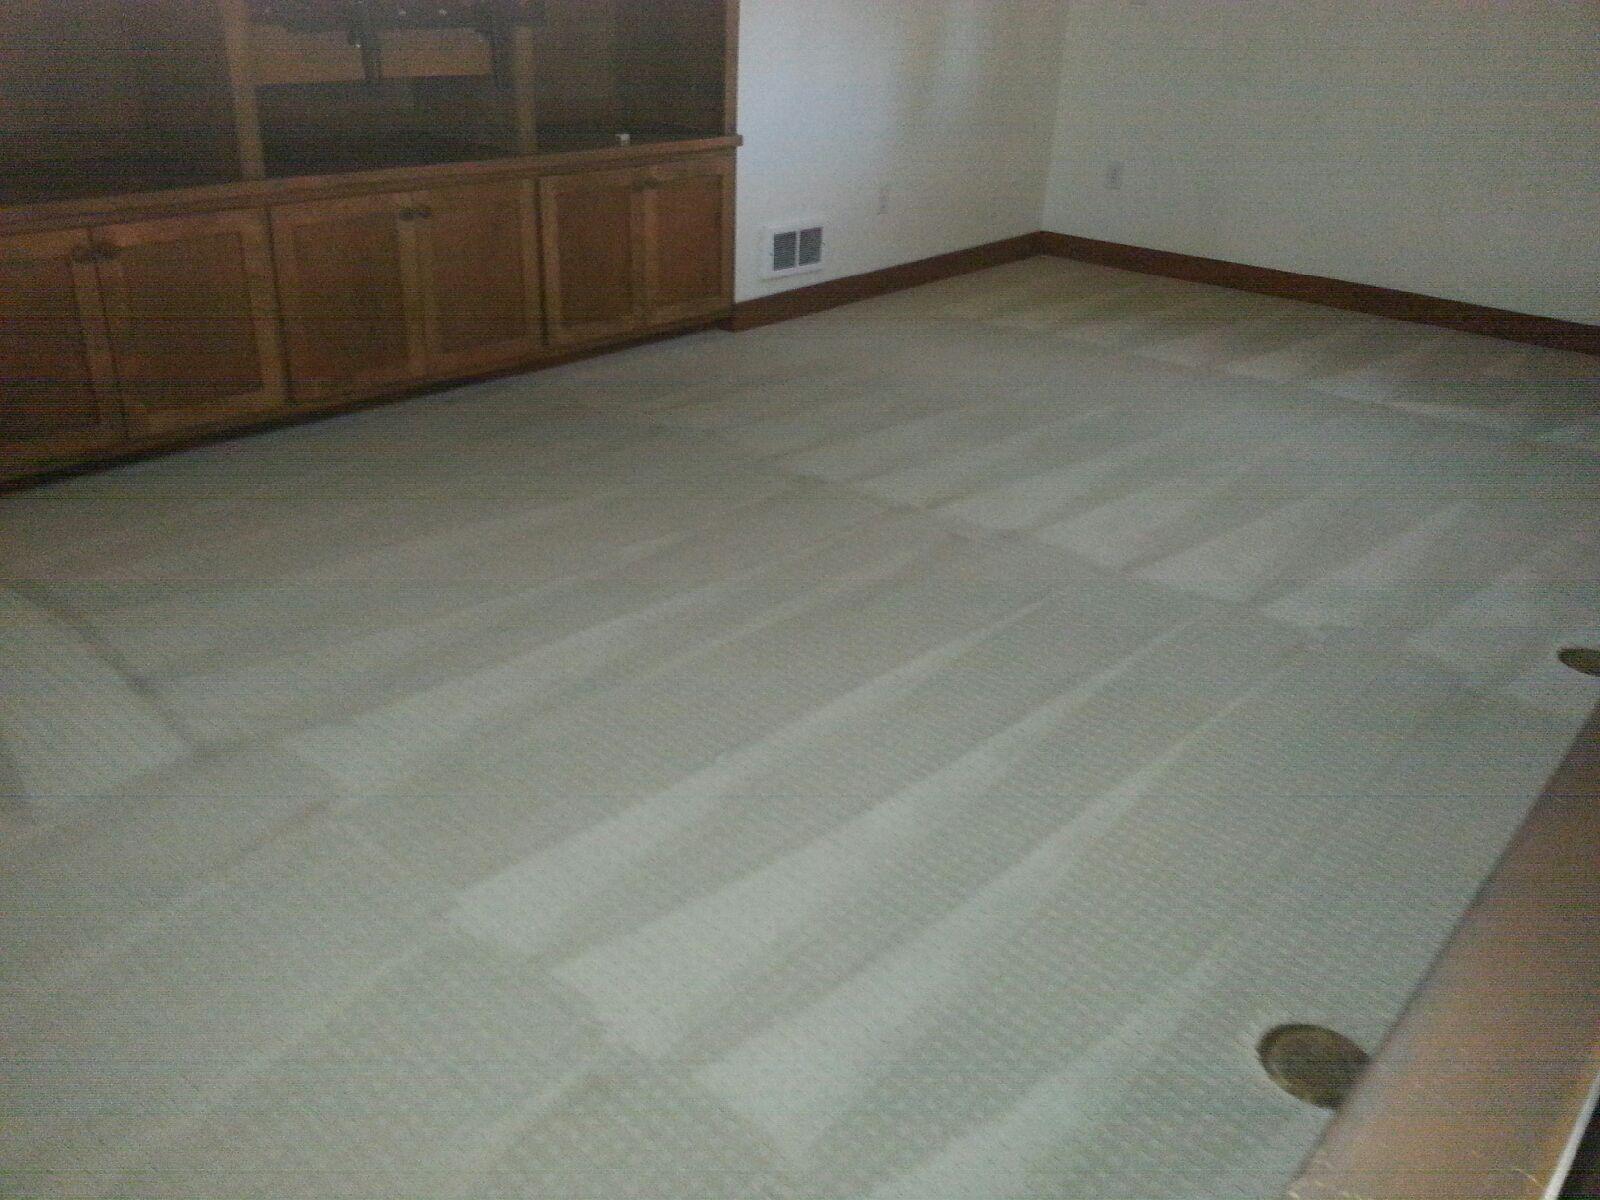 Anderson Carpet Wood Amp Tile Cleaning Seattle Washington